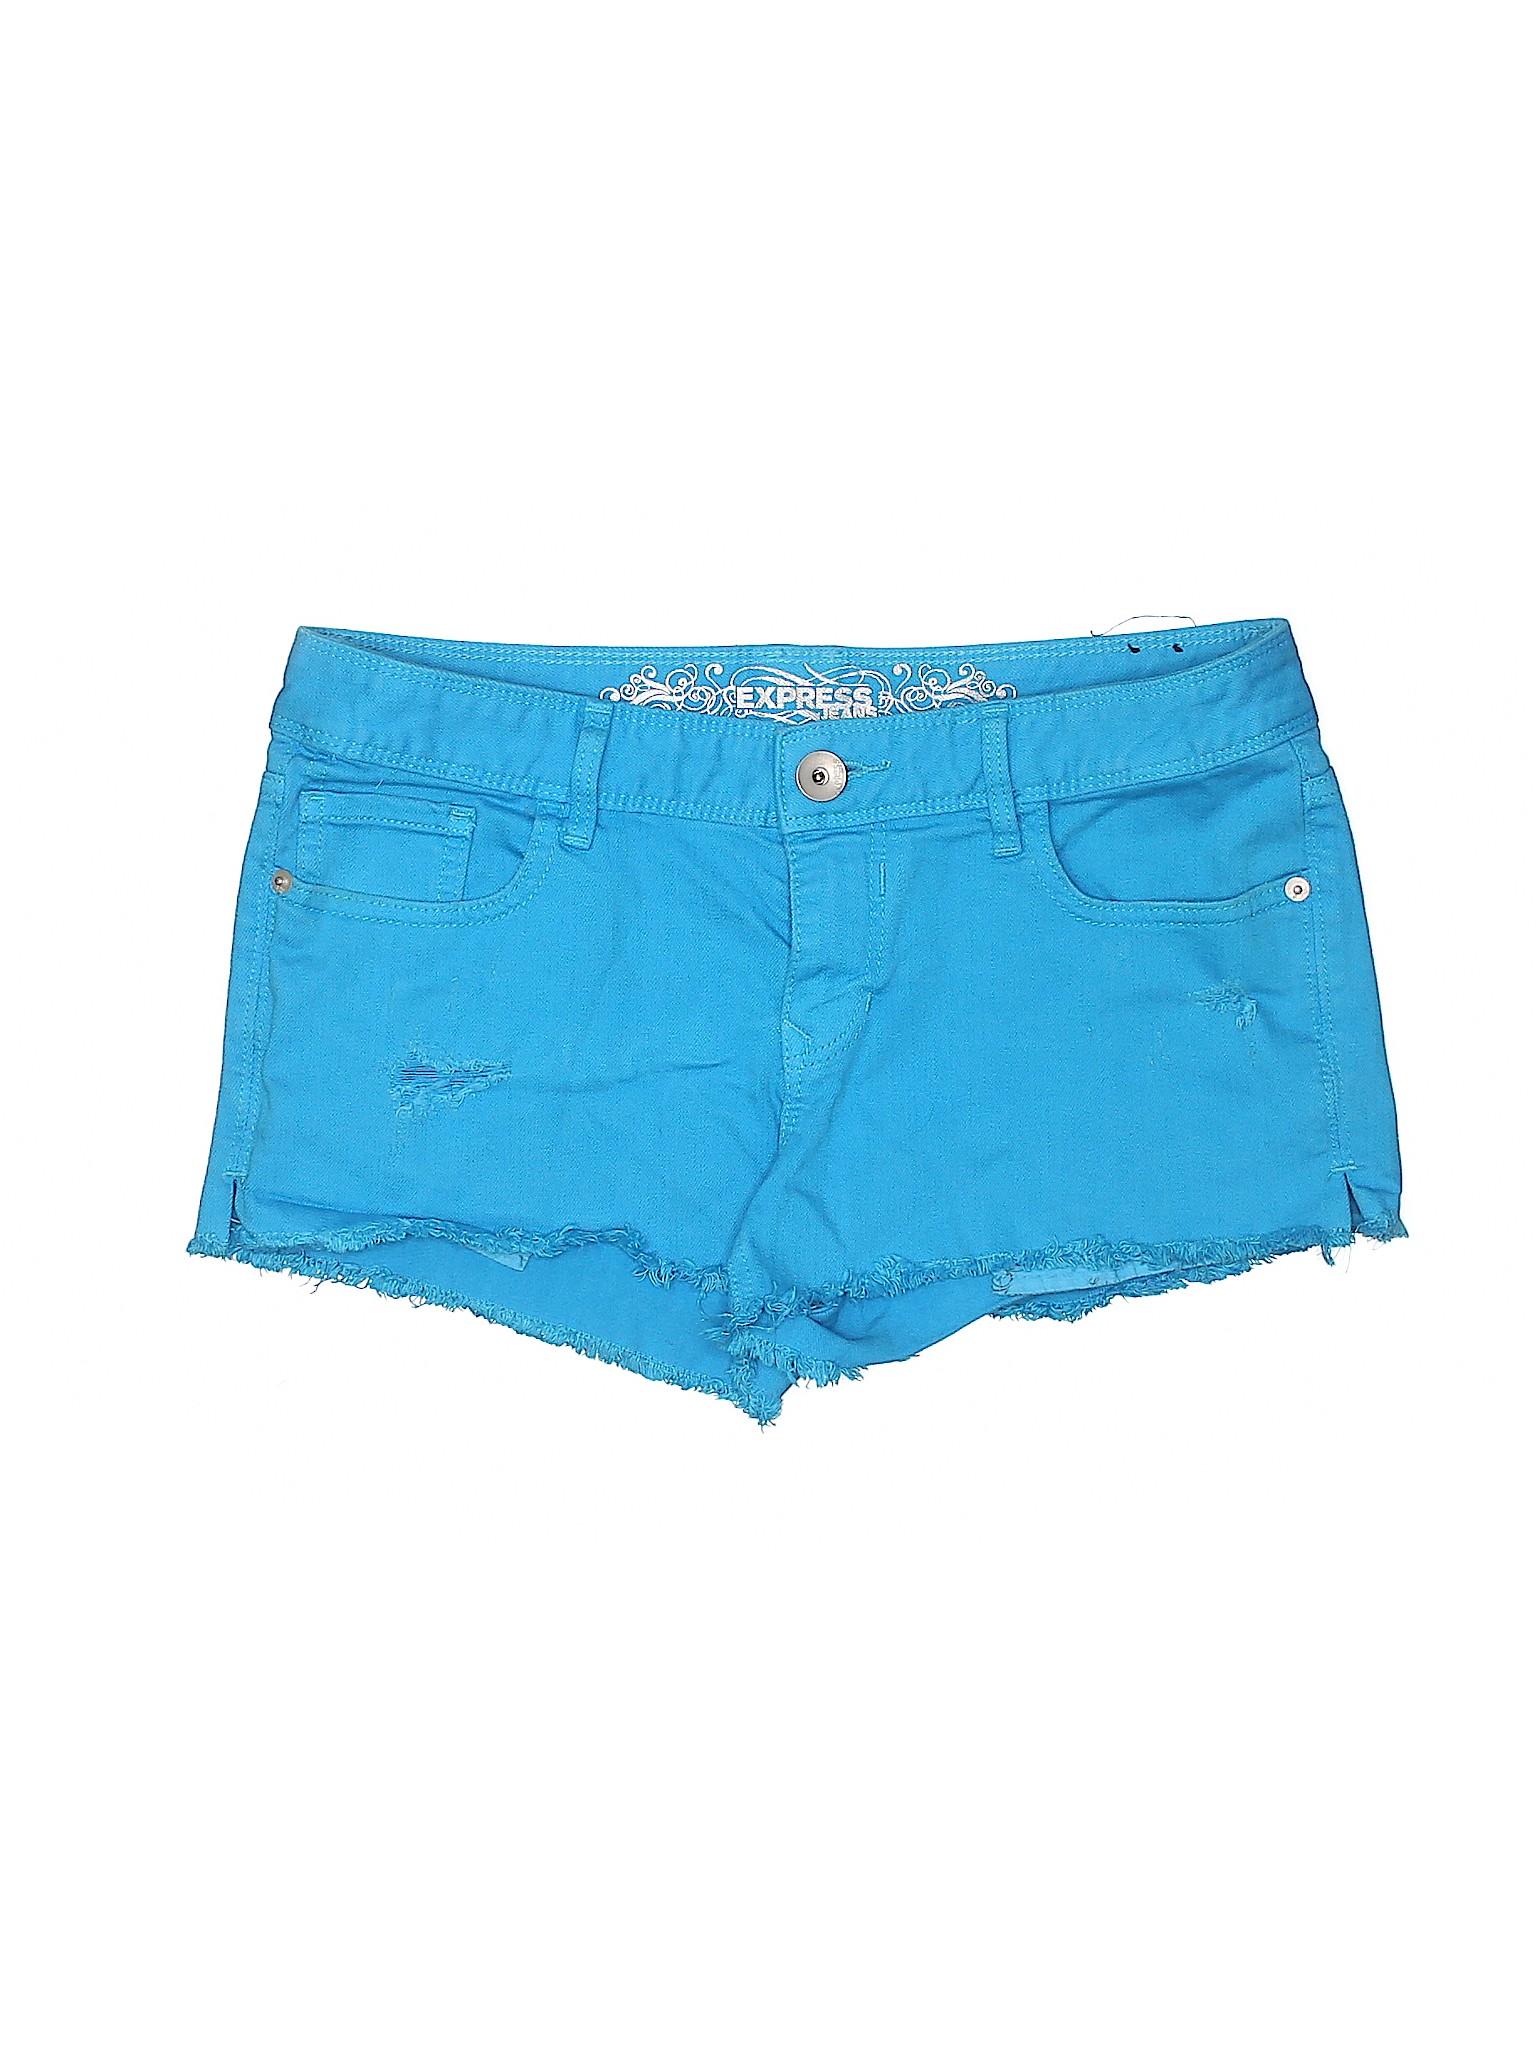 Denim Jeans Boutique Jeans Boutique Boutique Denim Express Jeans Shorts Express Shorts Express Denim xwtA6g